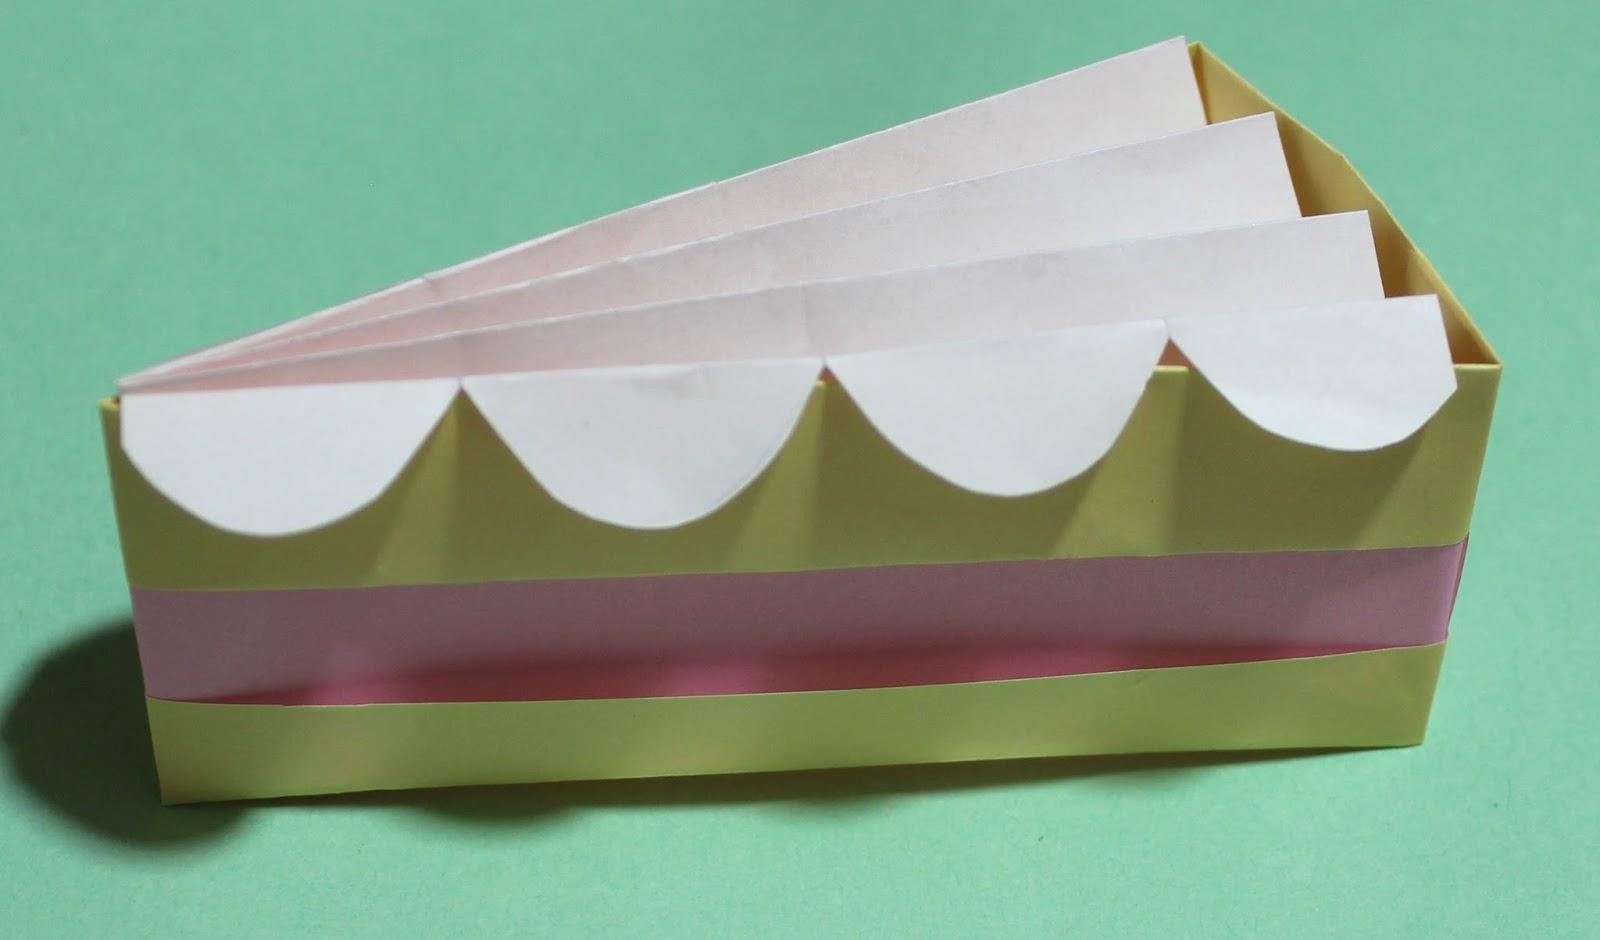 Origami Slice Of Cake Instructions